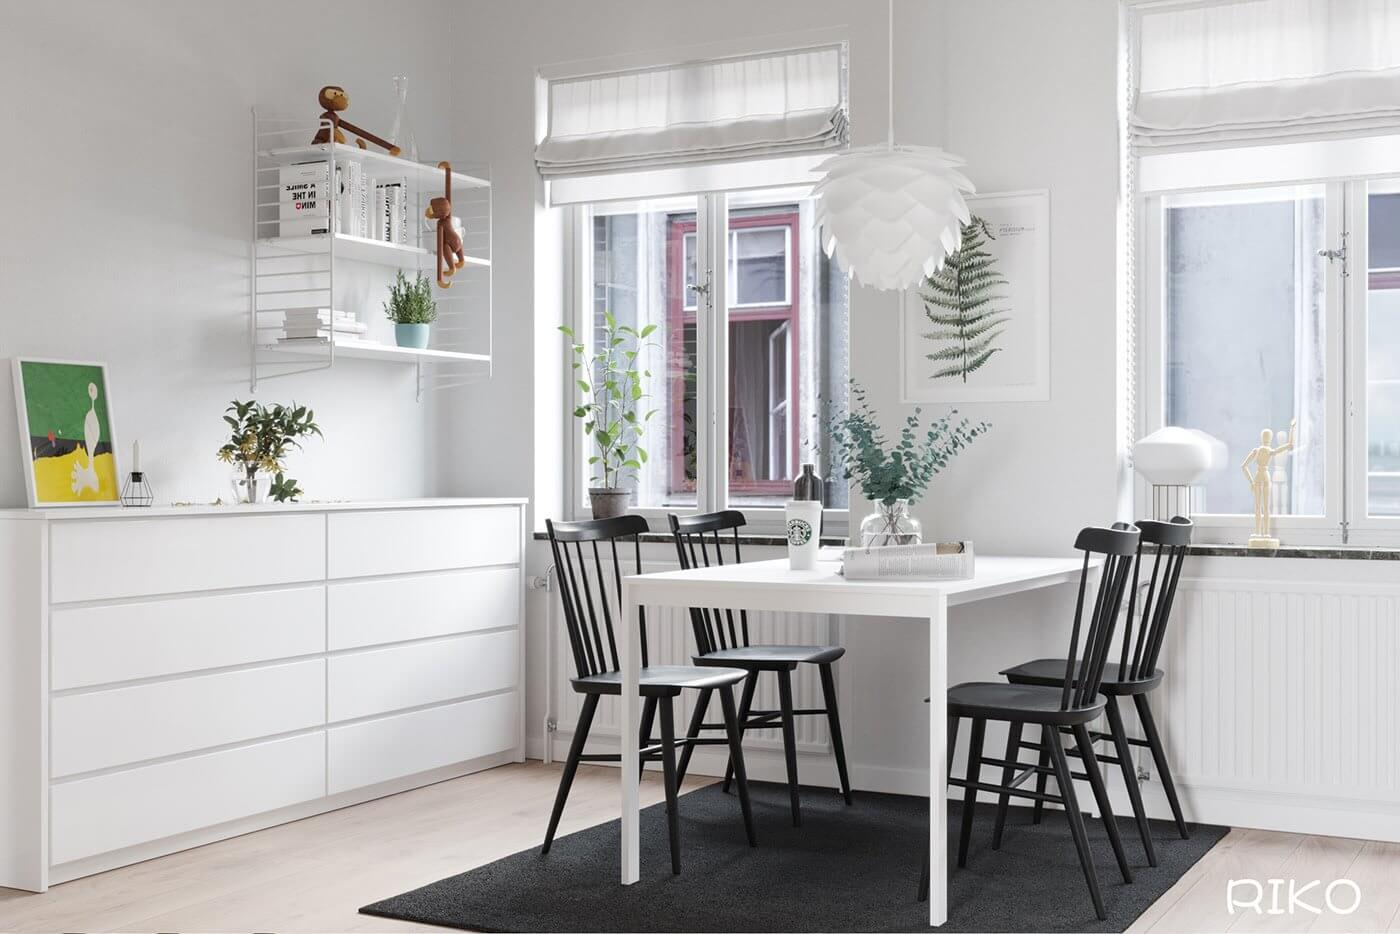 White kitchen design dining table white chair black - cgi visualization